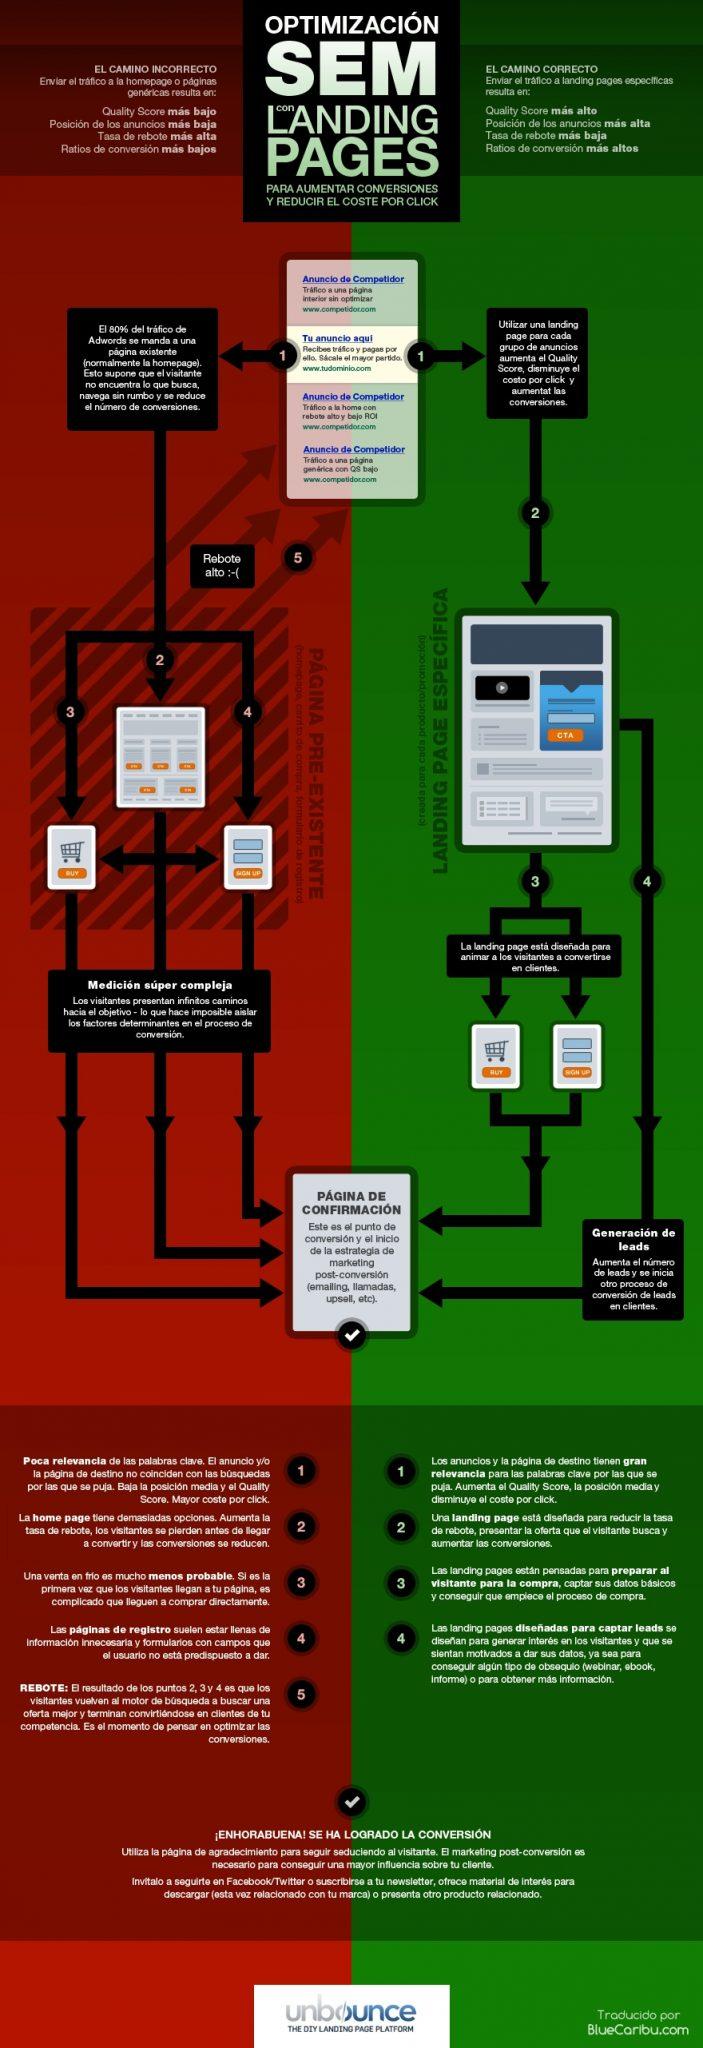 infografia-optimizacion-sem-landing-pages